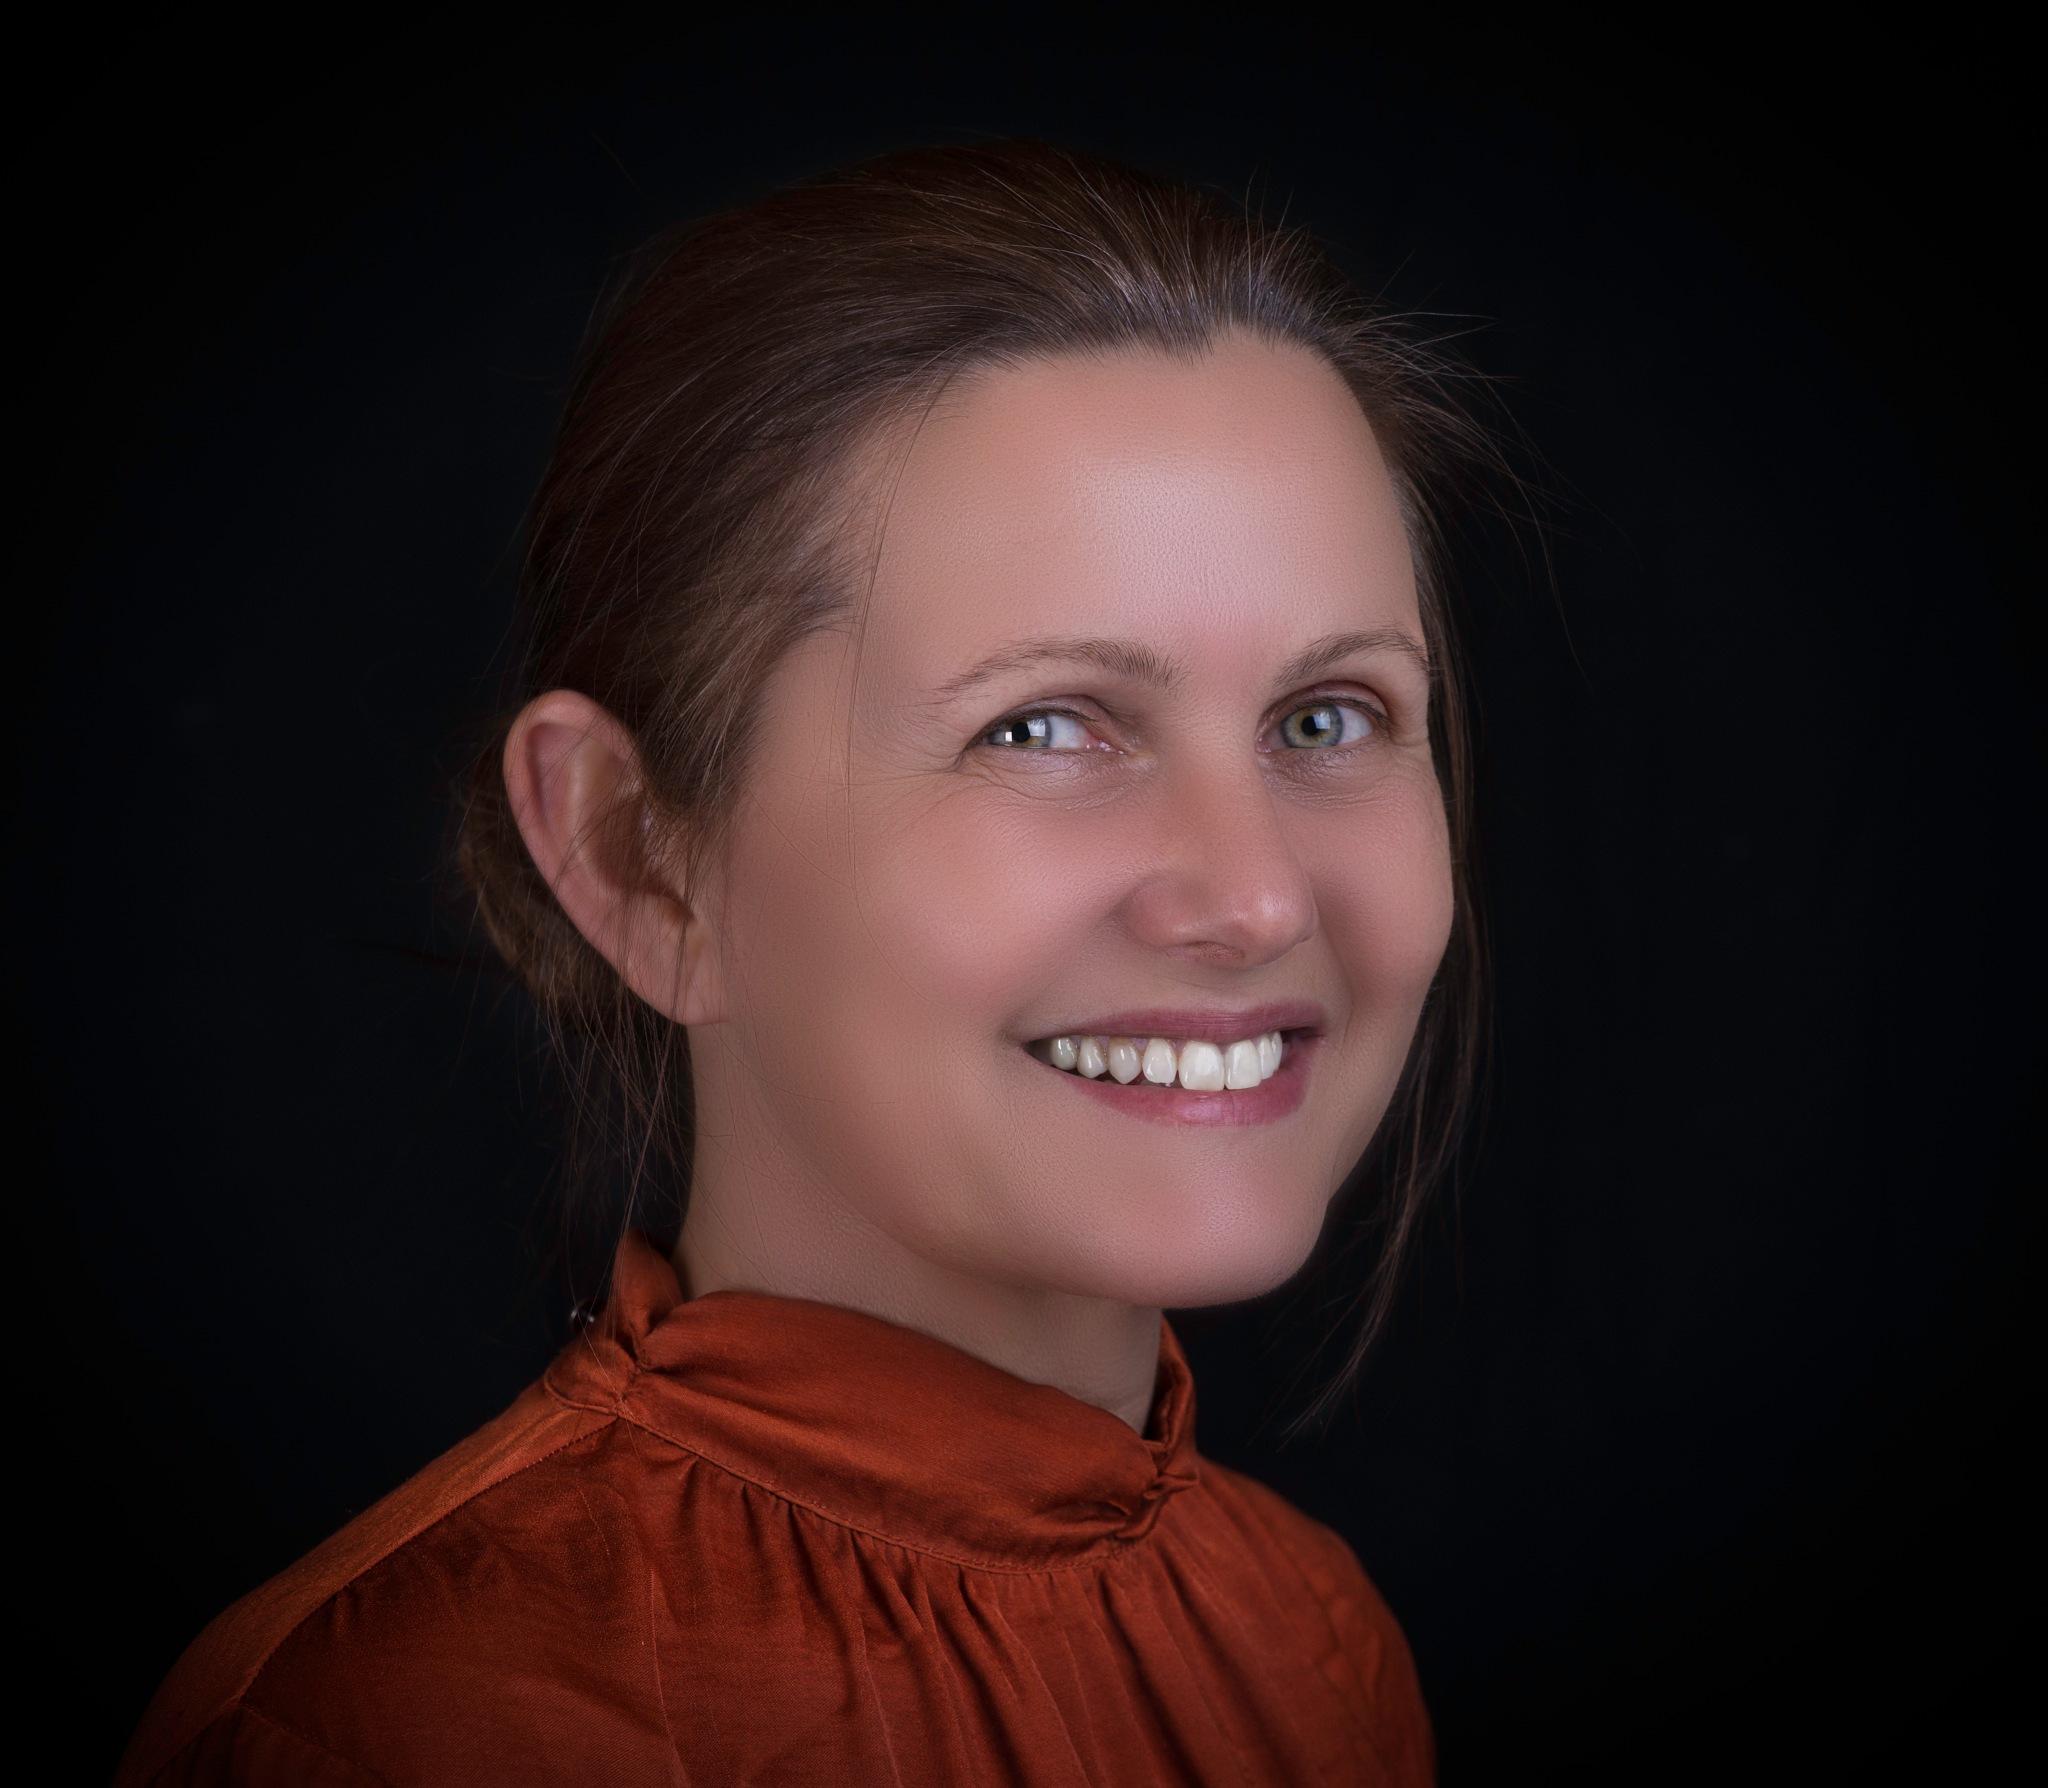 My Wife by Kristen Tande